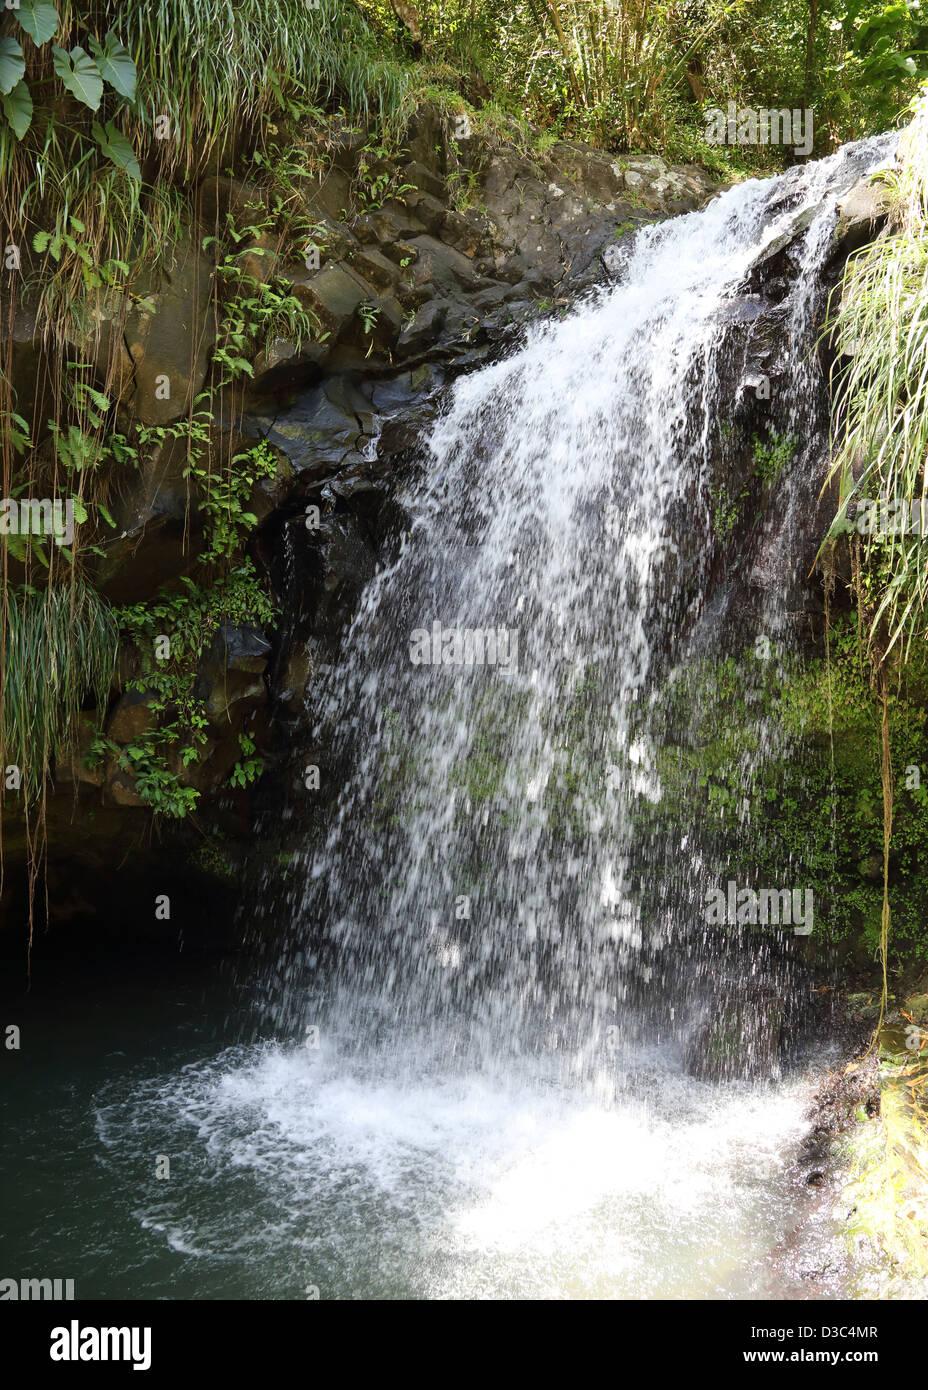 ANNANDALE FALLS,GRAND ETANG FOREST RESERVE,GRENADA, Stock Photo